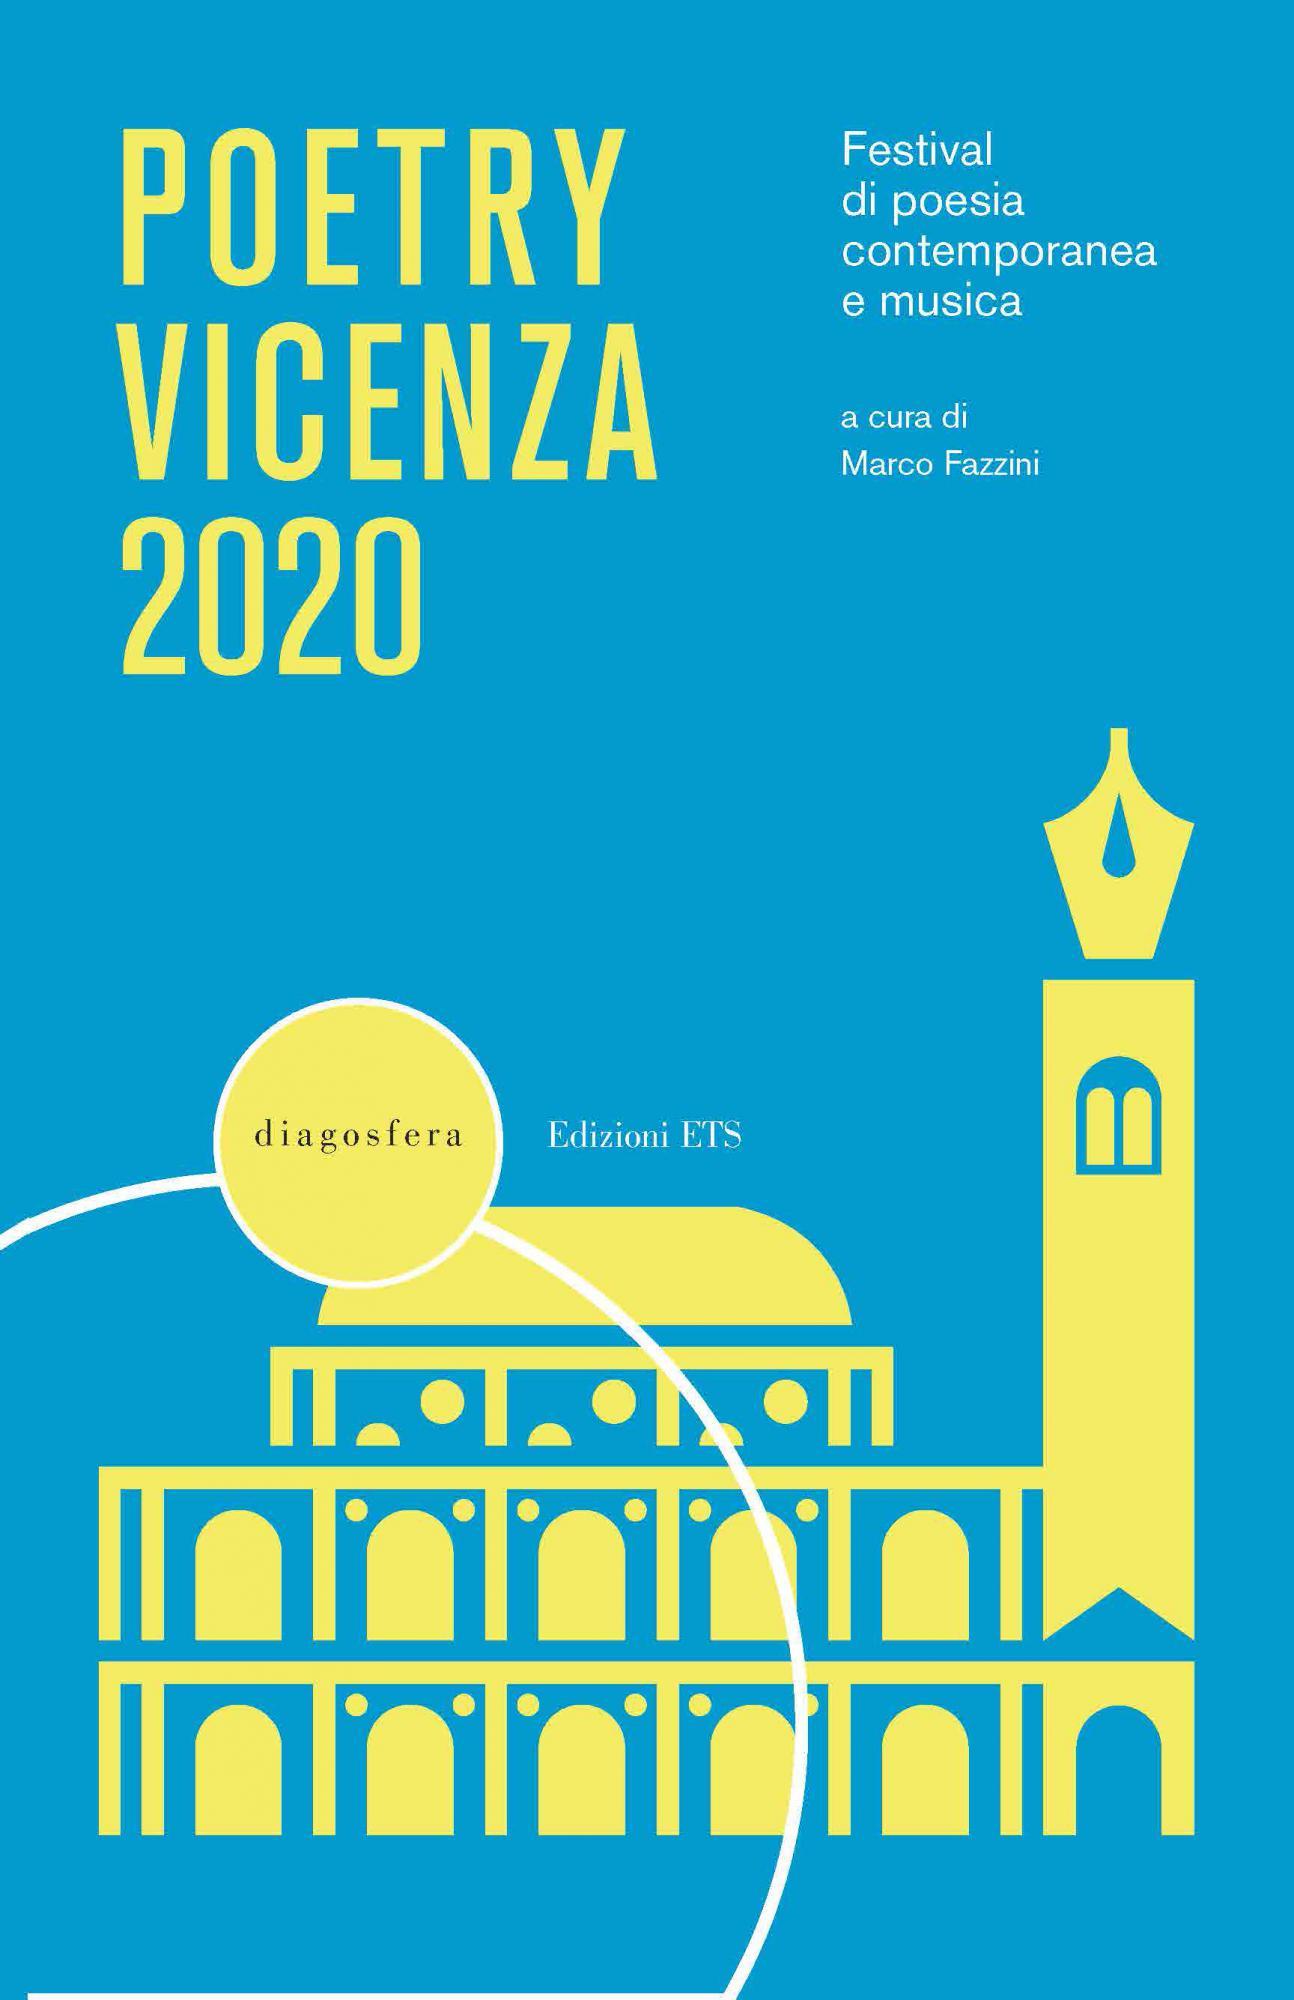 Poetry Vicenza 2020-<em>novità in arrivo</em>.Festival di poesia contemporanea e musica